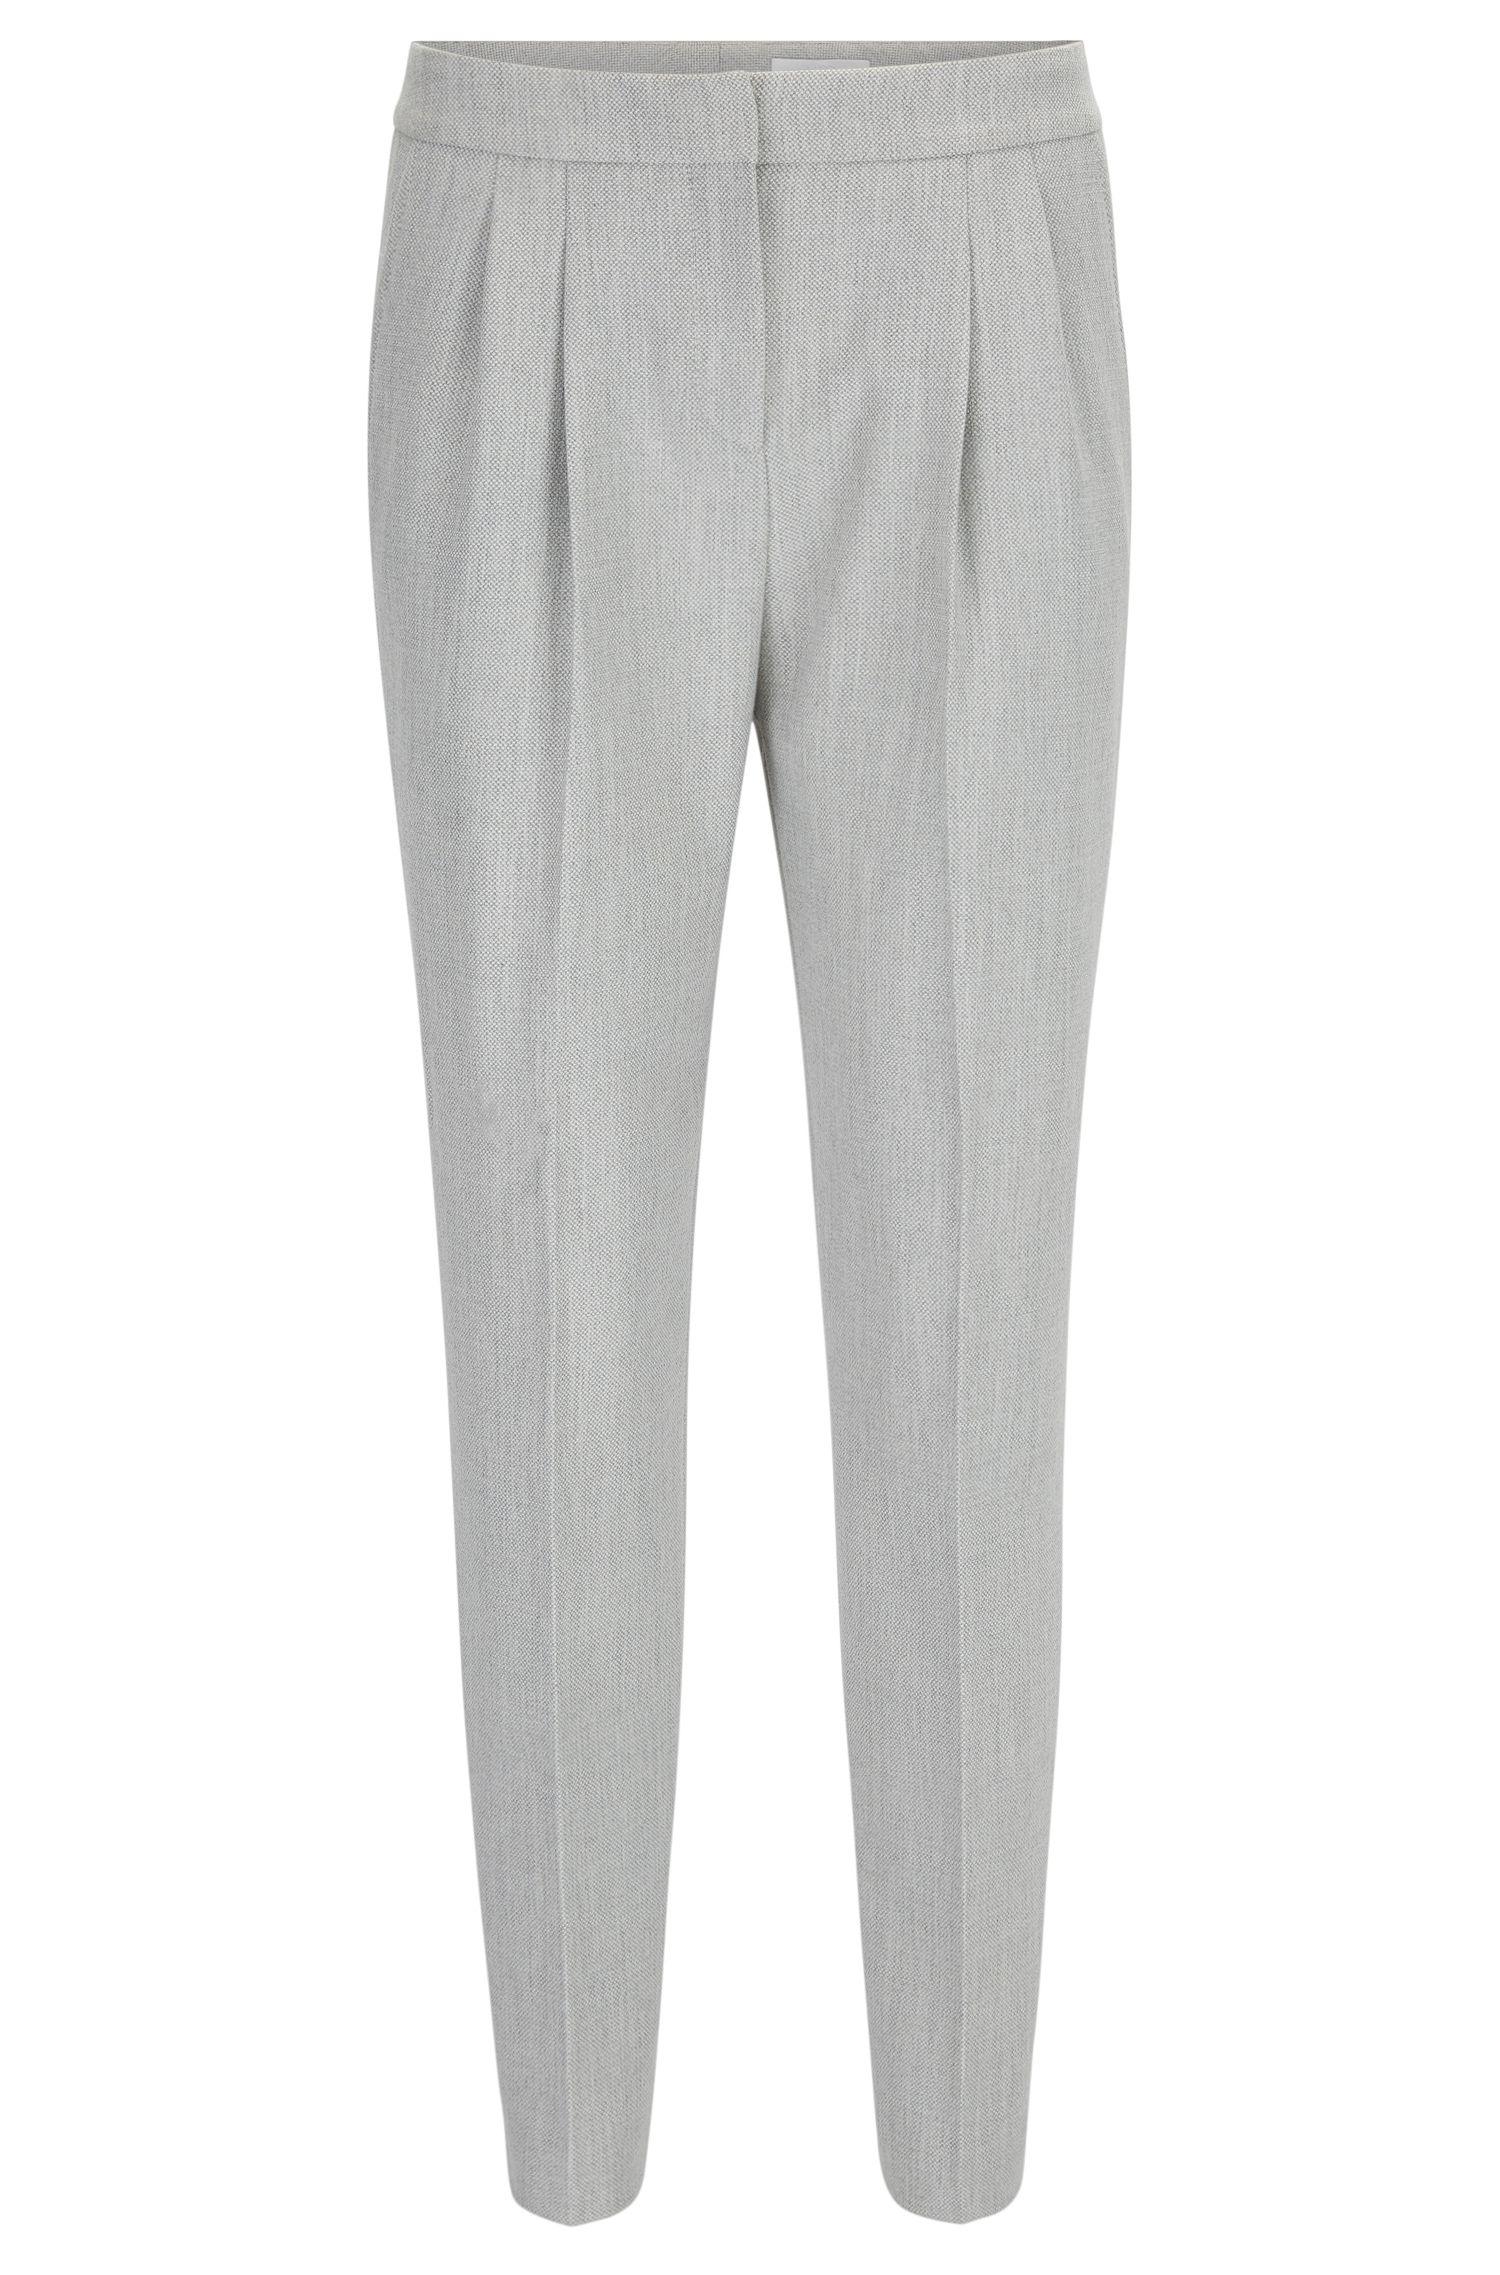 Stretch Crop Pant | Tisuena, Patterned